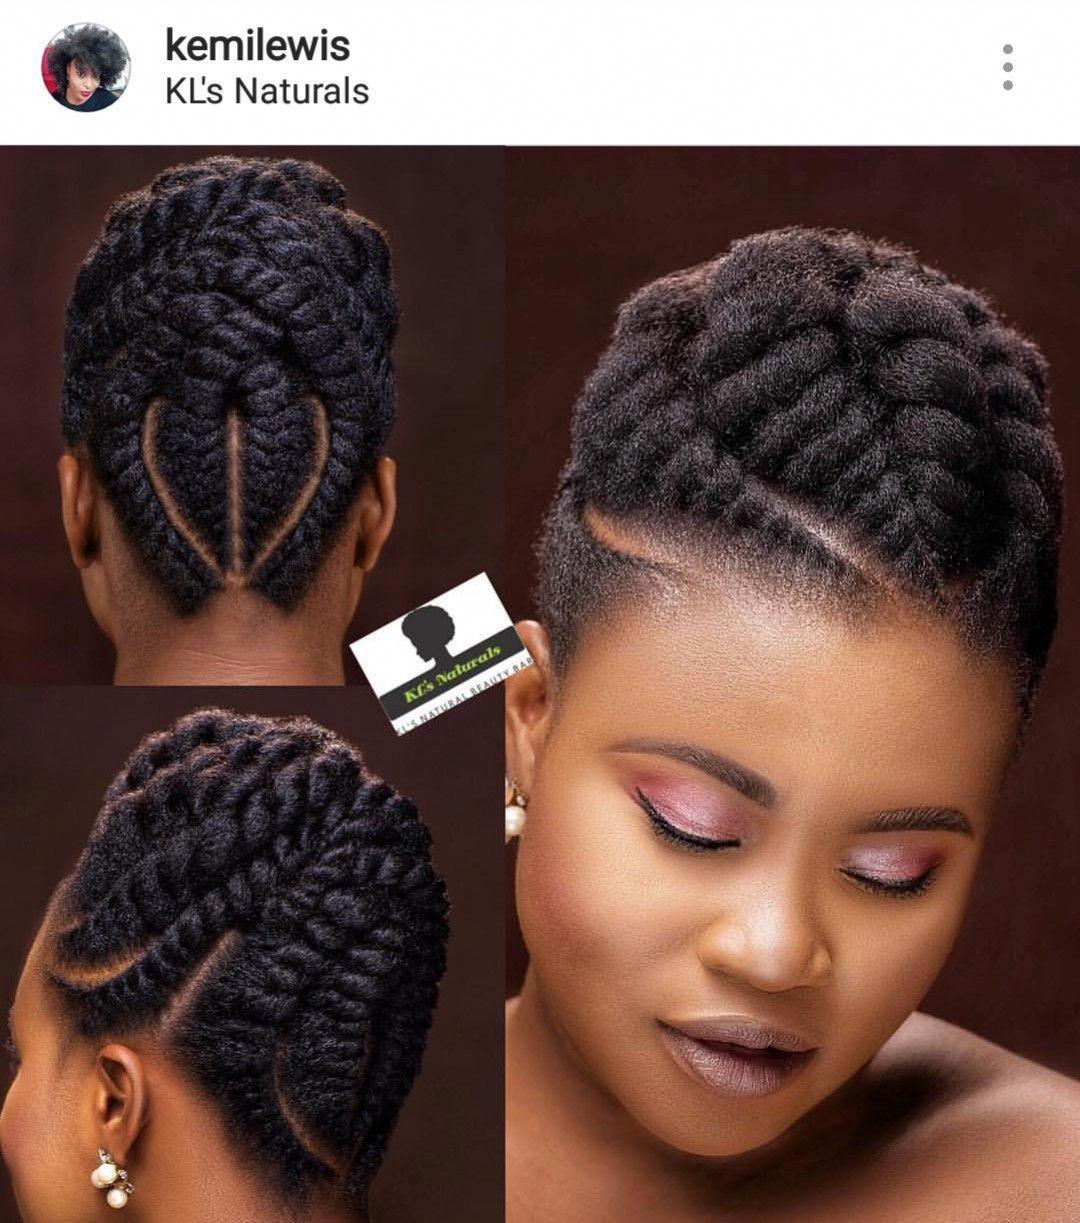 Braid Hairstyles African American Half Up Half Down Howtobraidhair Natural Hair Twists African Braids Hairstyles Natural Hair Styles